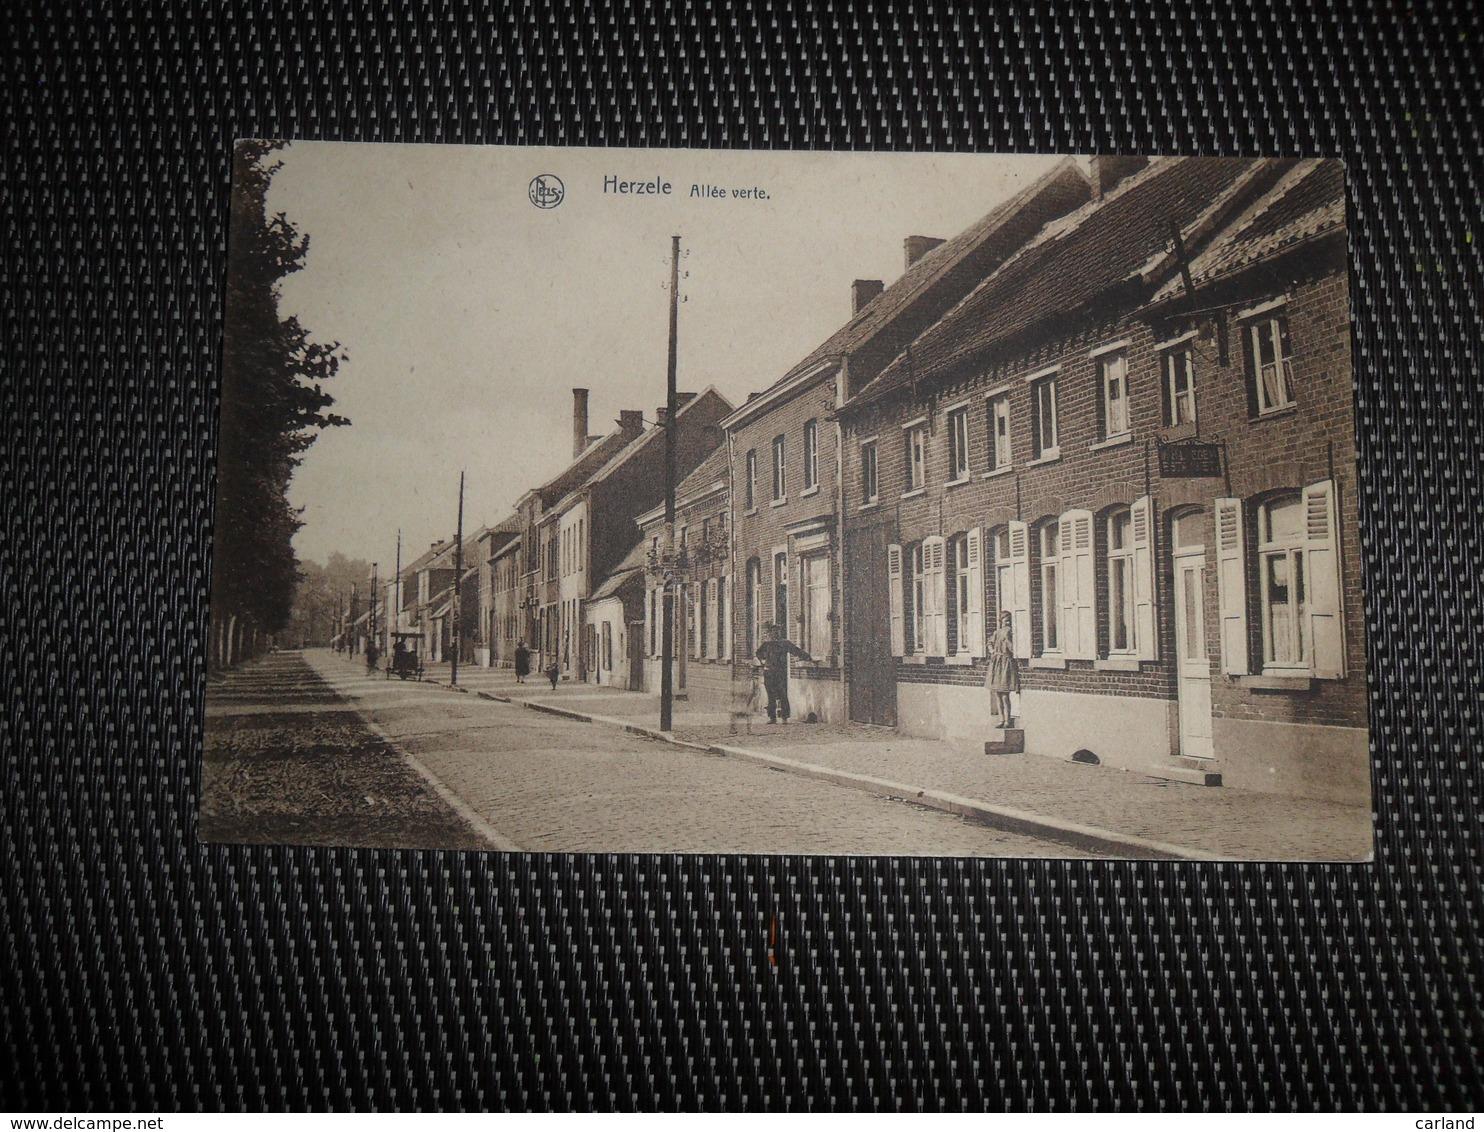 Très Beau Lot De 60 Cartes Postales De Belgique     Zeer Mooi Lot Van 60 Postkaarten Van België  - 60 Scans - Cartes Postales